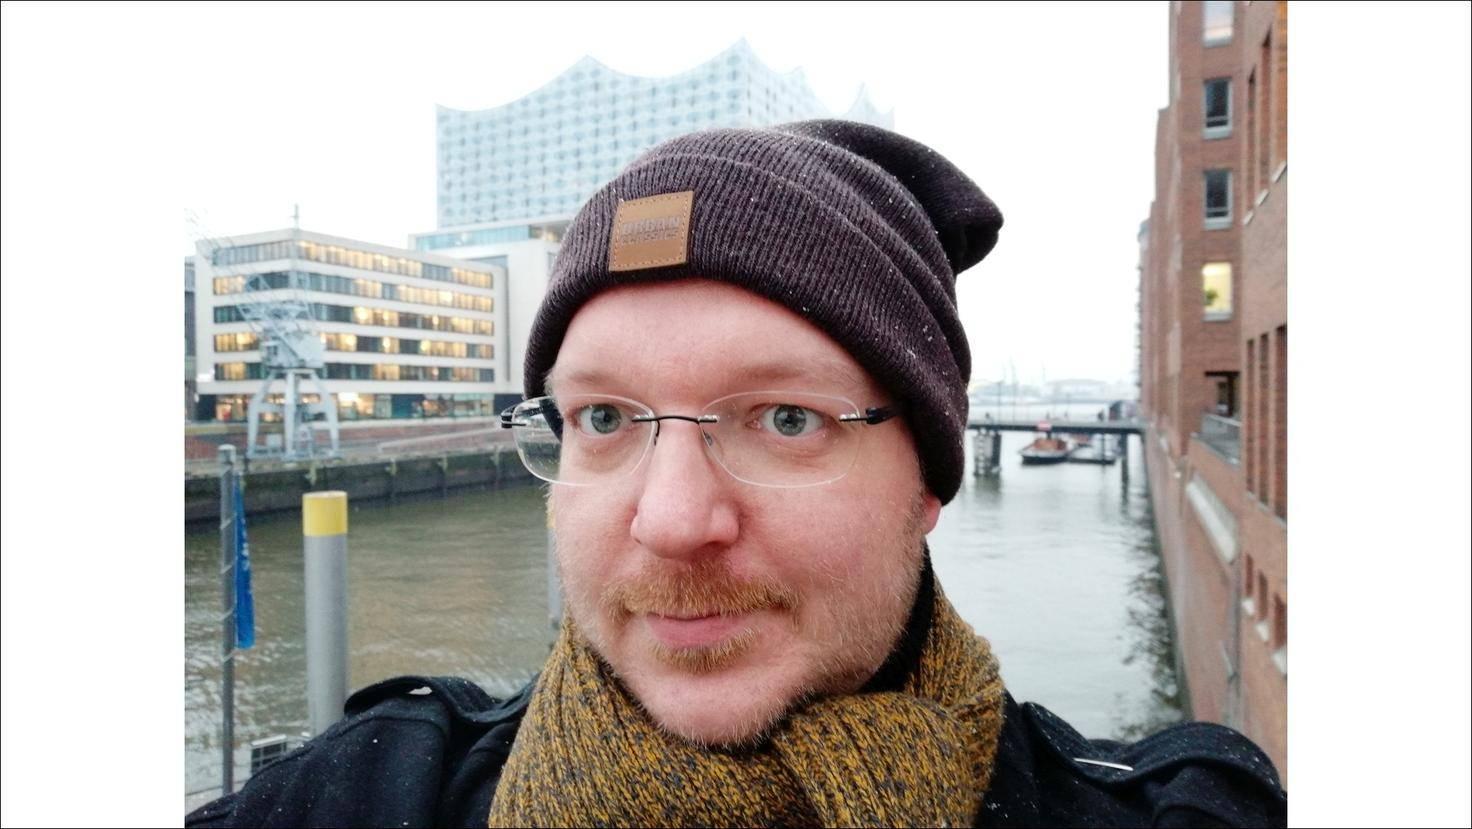 Für Selfies ist die Dual-Cam besonders praktisch.